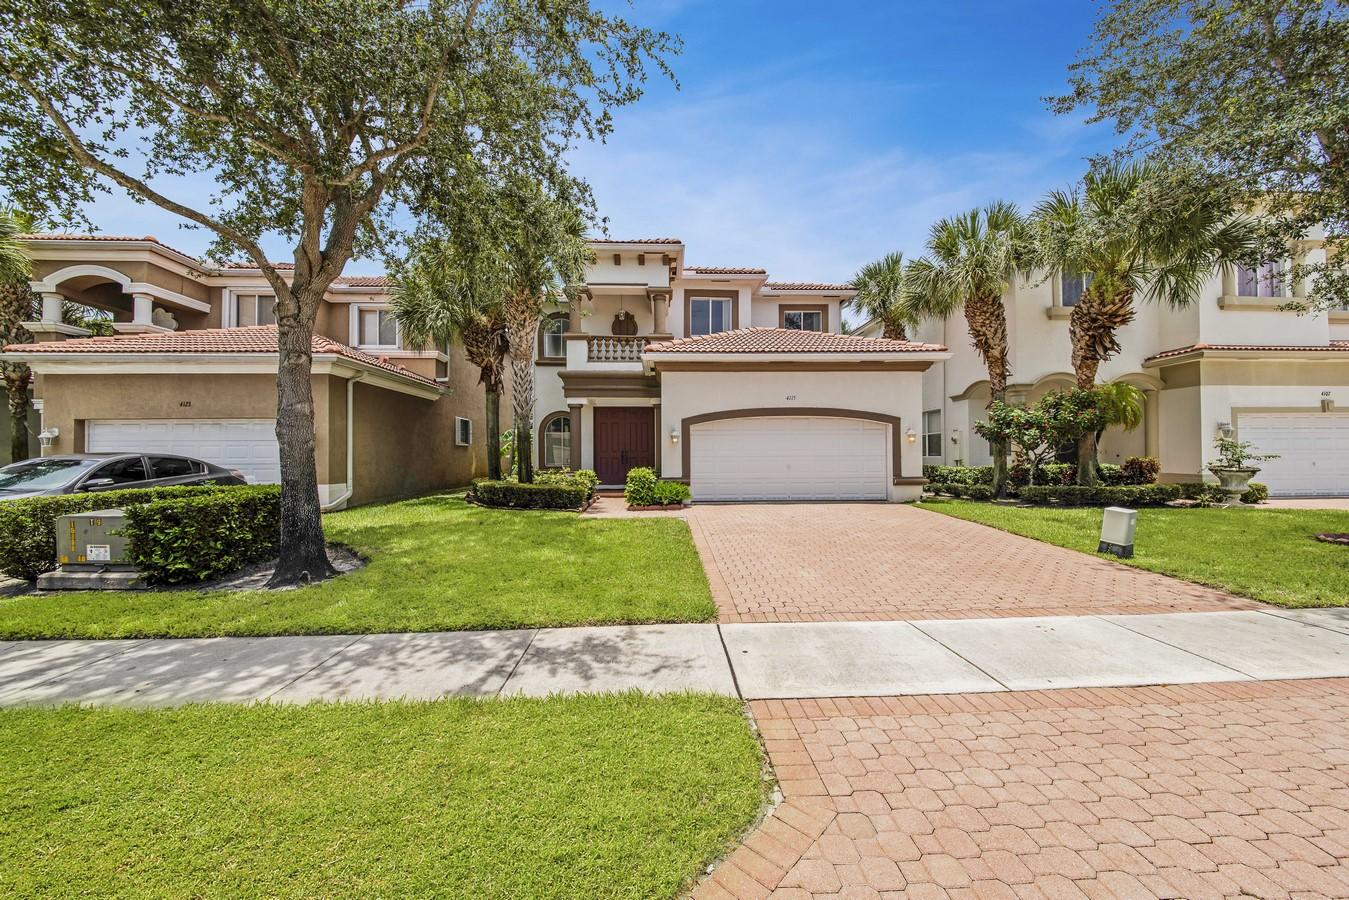 4115 Heartstone Place  Boynton Beach, FL 33436